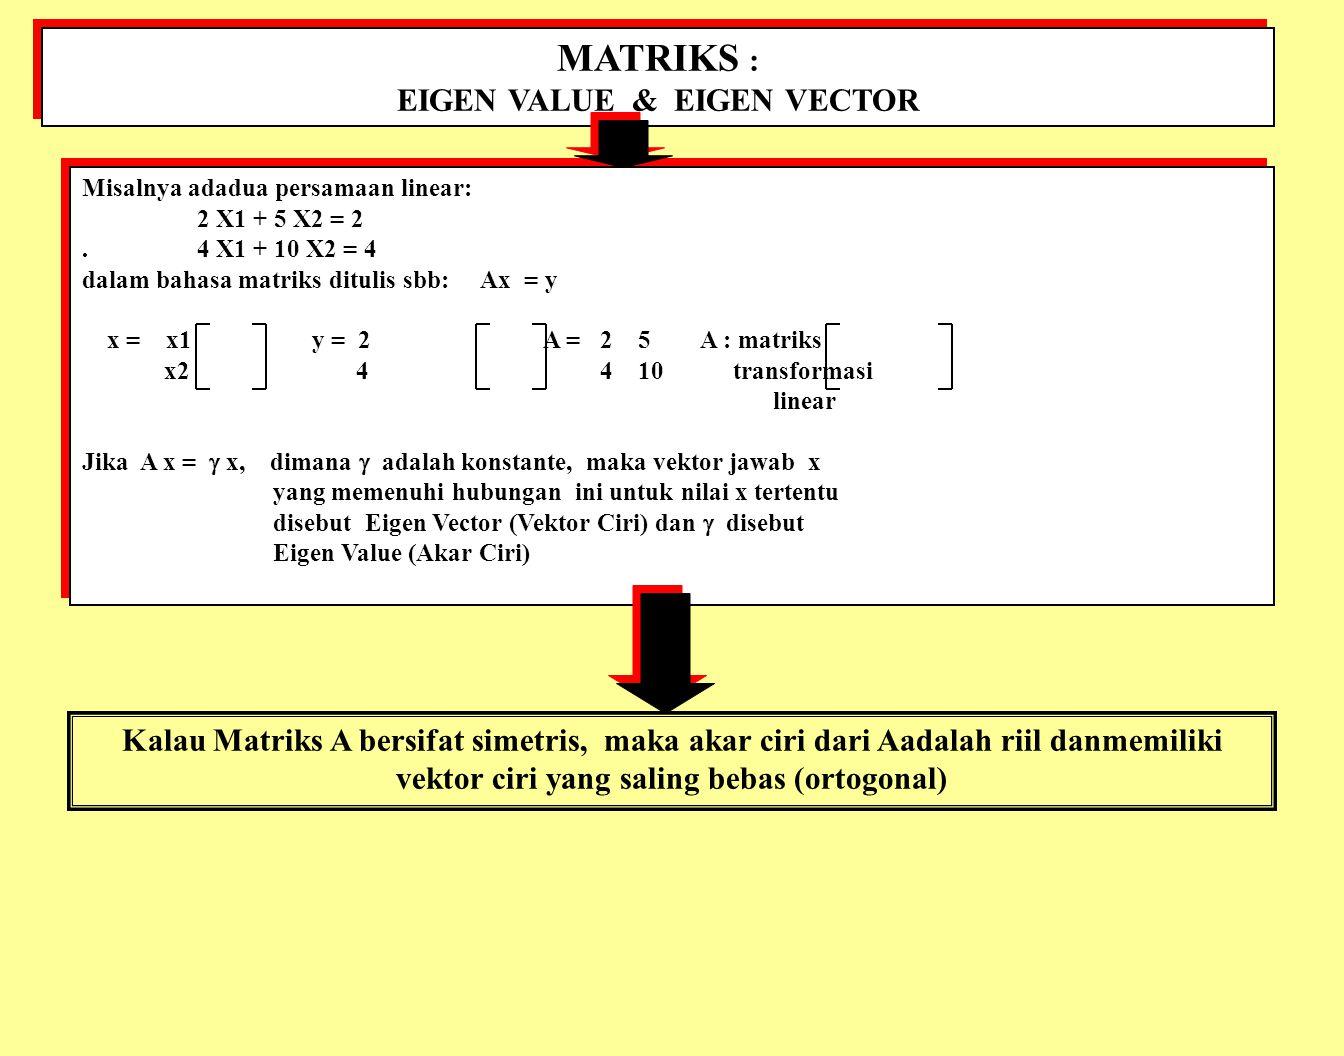 PRINCIPLE COMPONENT ANALYSIS: PCA Input Data: Matriks kovarians: kalau semua variabel punya satuan yg sama dan homogen, dipakai raw data Matrik korelasi: kalau satuannya tidak sama, standardize data Input Data: Matriks kovarians: kalau semua variabel punya satuan yg sama dan homogen, dipakai raw data Matrik korelasi: kalau satuannya tidak sama, standardize data Output: Variabel komposit atau disebut Dimensi, Komponen Utama Nilai dari variabel komposit Output: Variabel komposit atau disebut Dimensi, Komponen Utama Nilai dari variabel komposit Metode Estimasi: Konsep Eigen Value dan Eigen Vector Metode Estimasi: Konsep Eigen Value dan Eigen Vector Kegunaan: Eksplorasi Dimensi yg terkandung dalam sekumpulan variabel Mendapatkan skor dari Komponen Utama Mapping objects Clustering objects Menghilangkan multikolinearitas pd regresi berganda